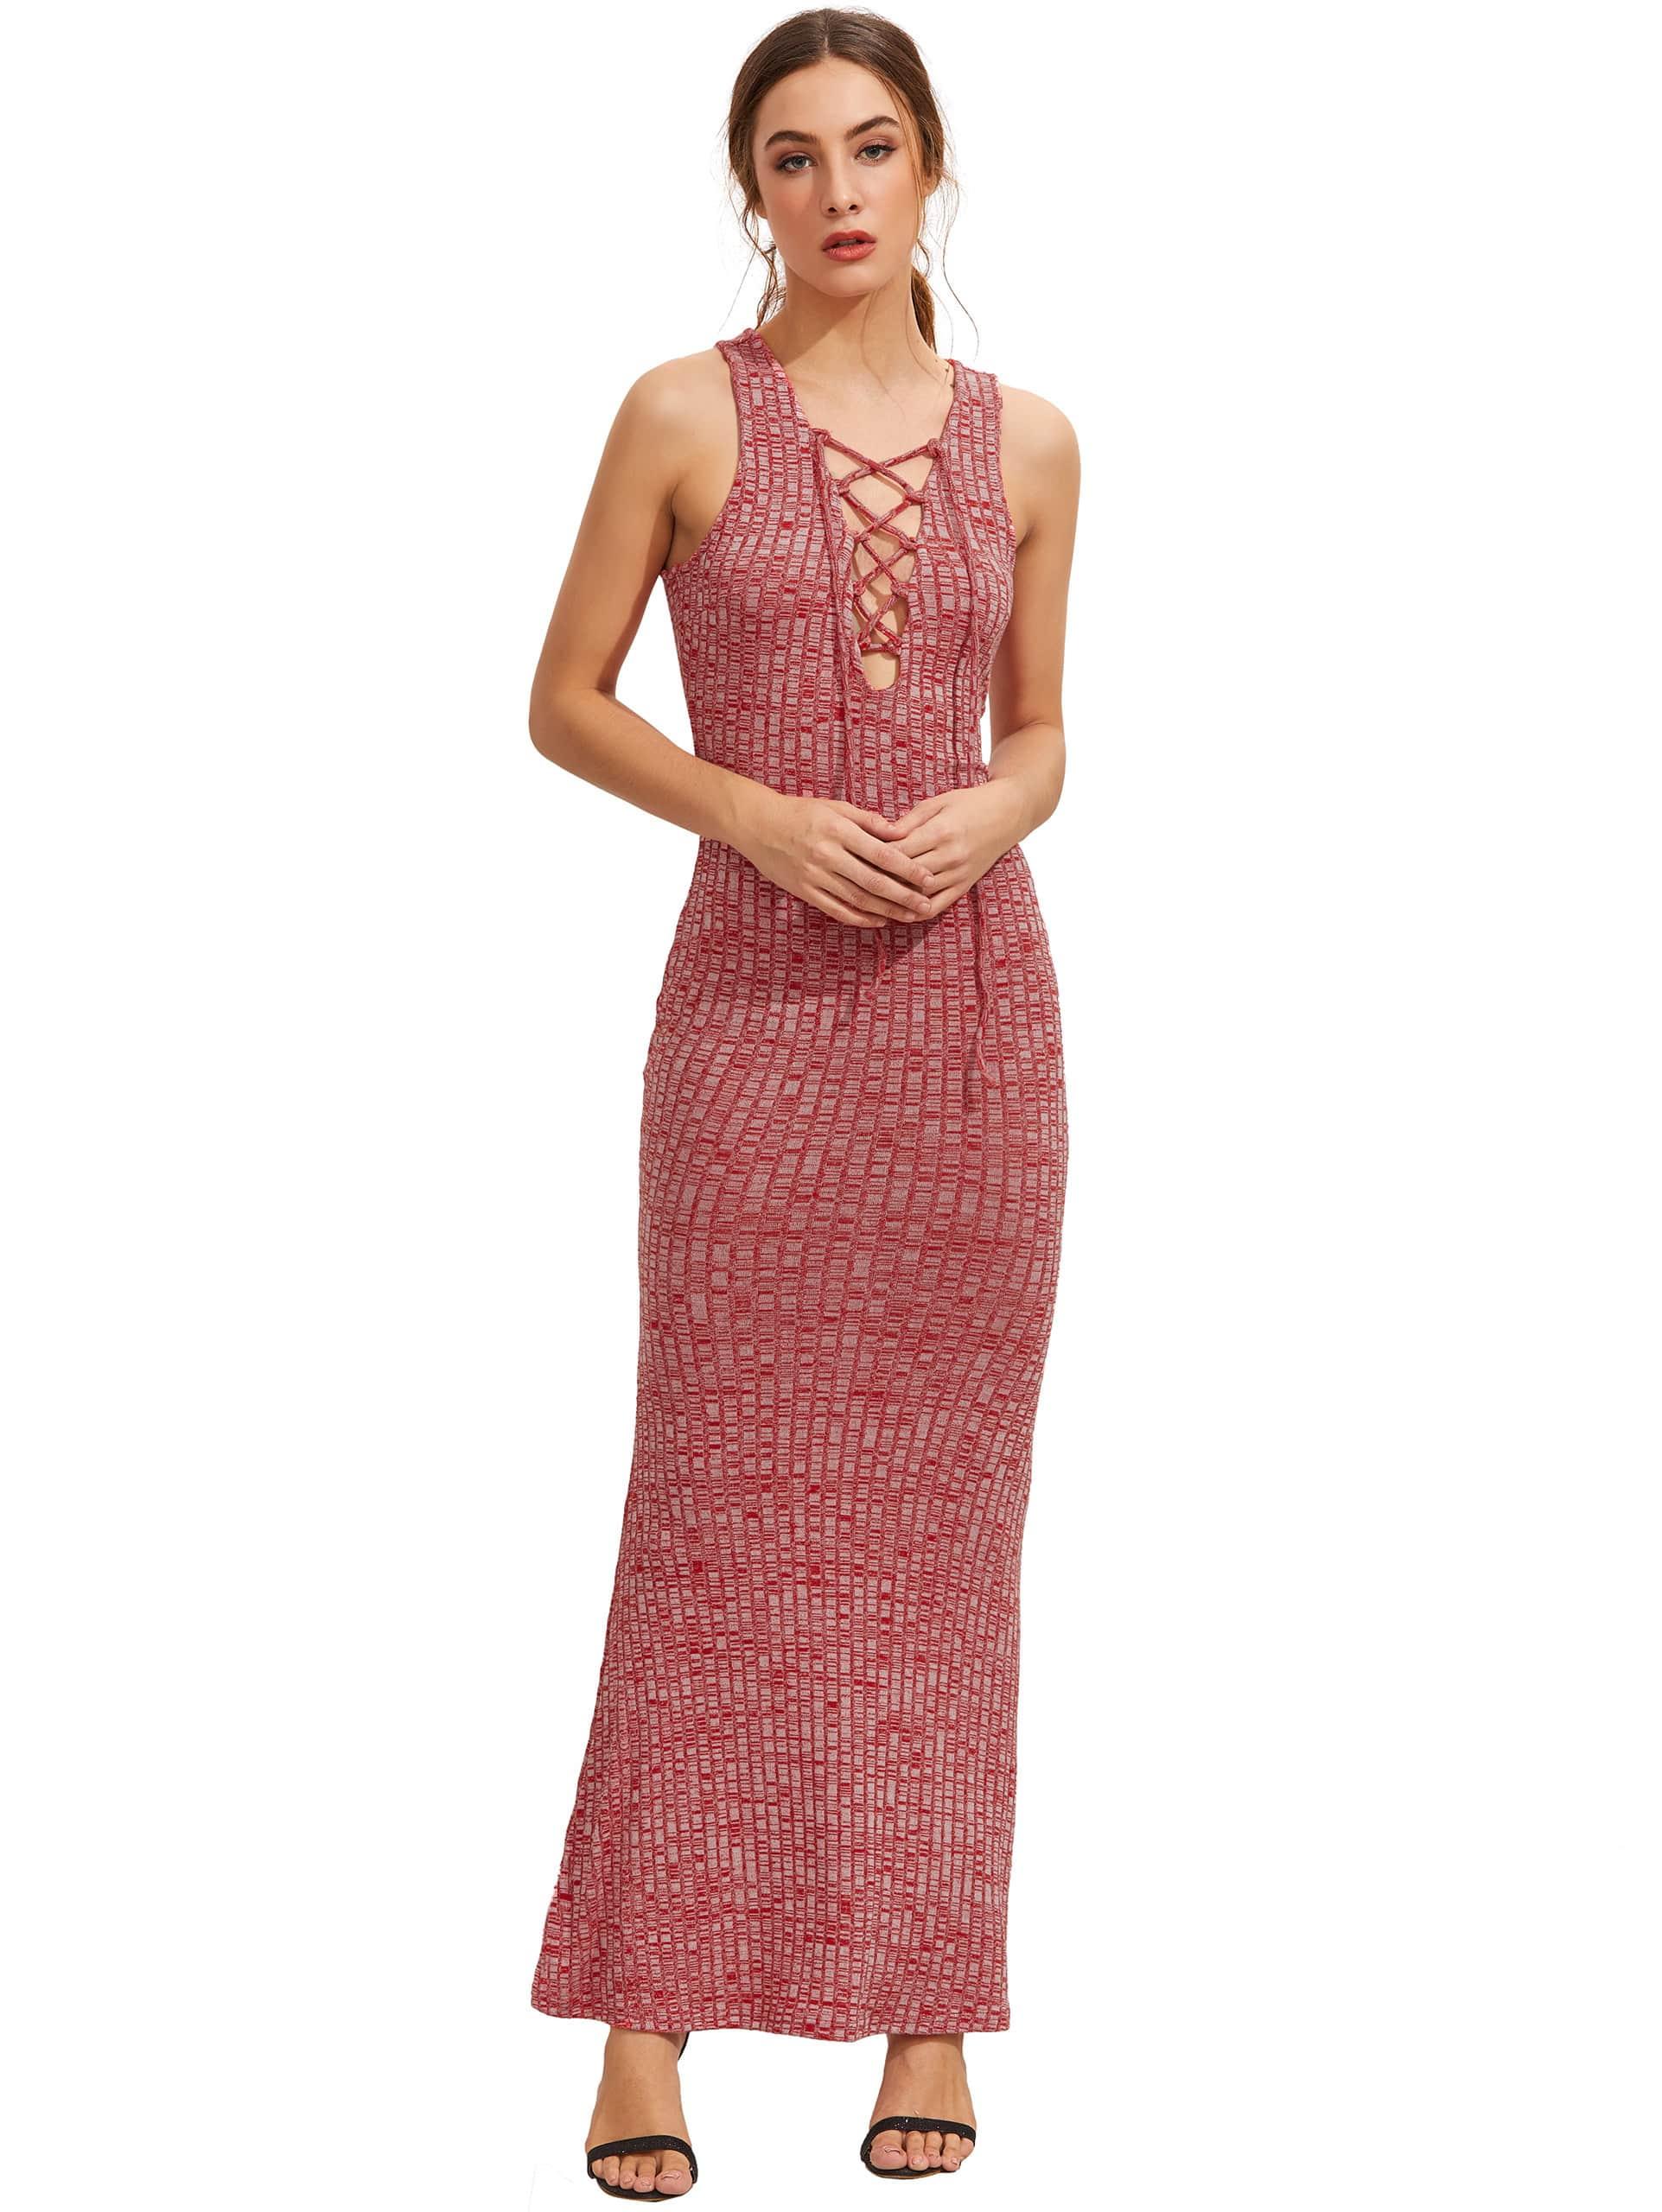 Lace Up Ribbed Maxi Dress dress160825551